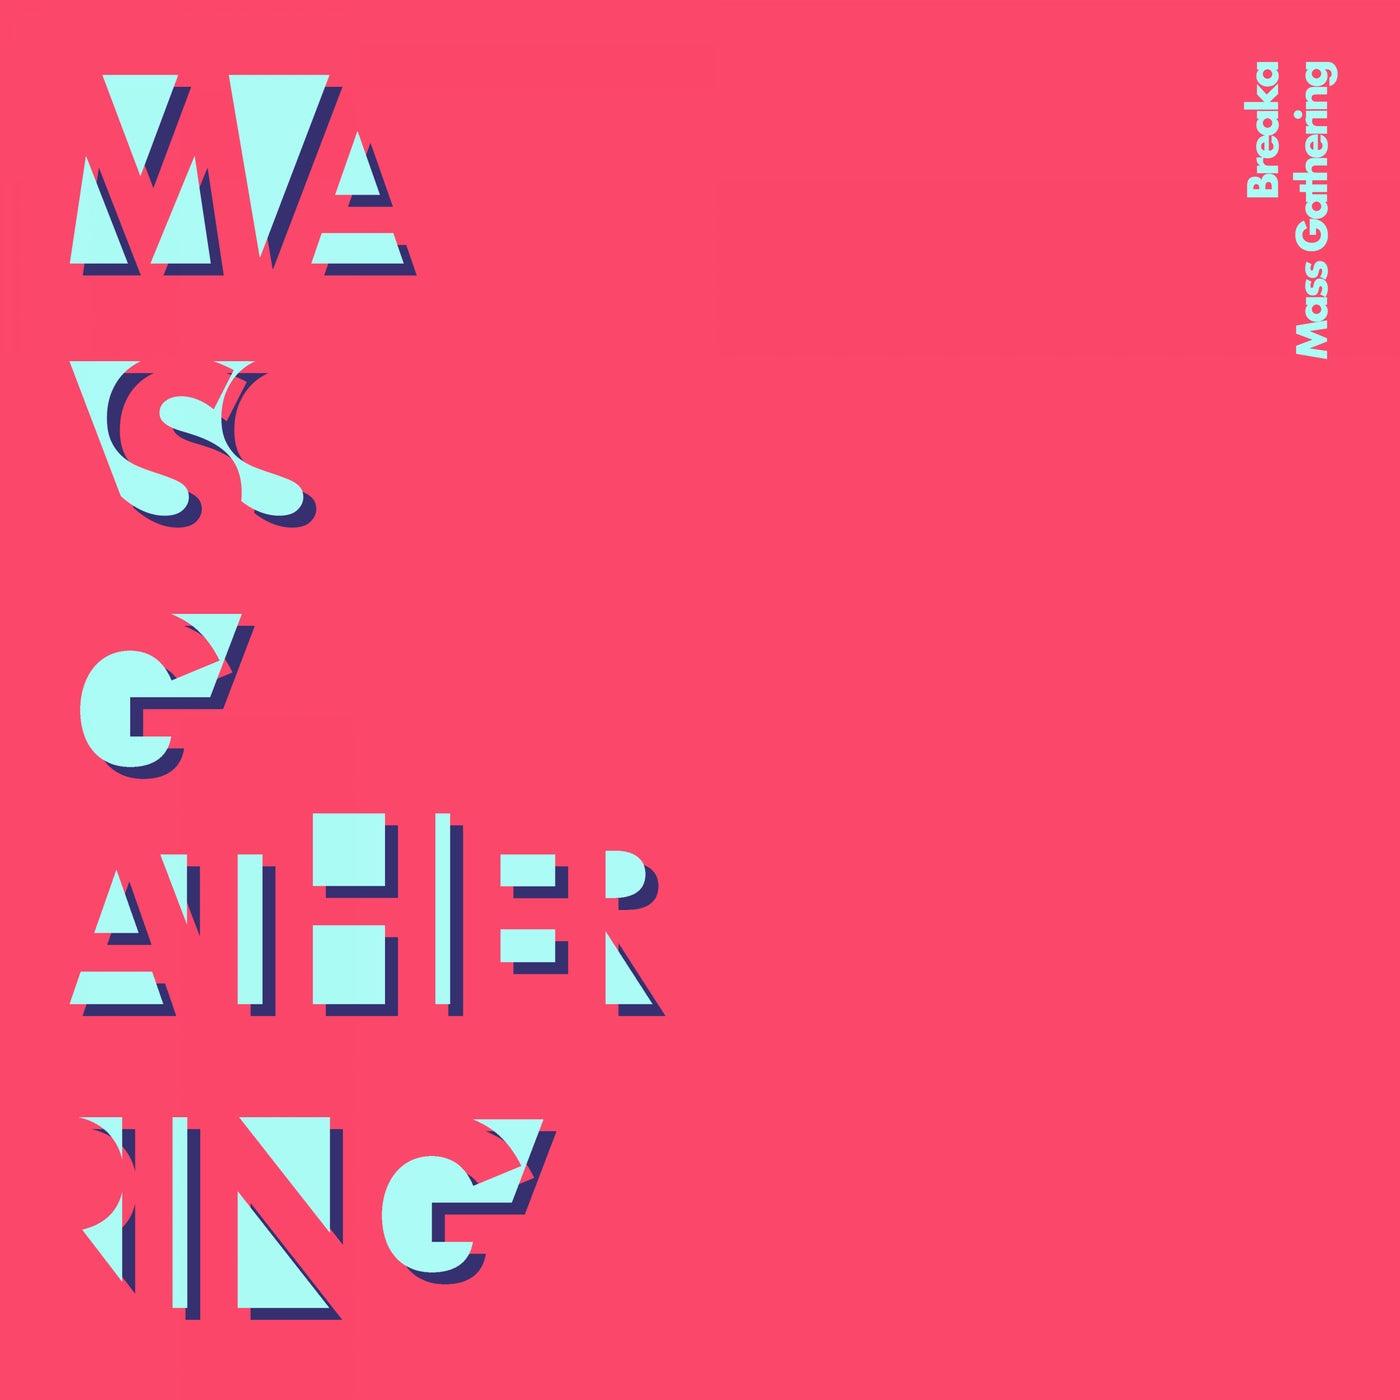 Mass Gathering (Original Mix)